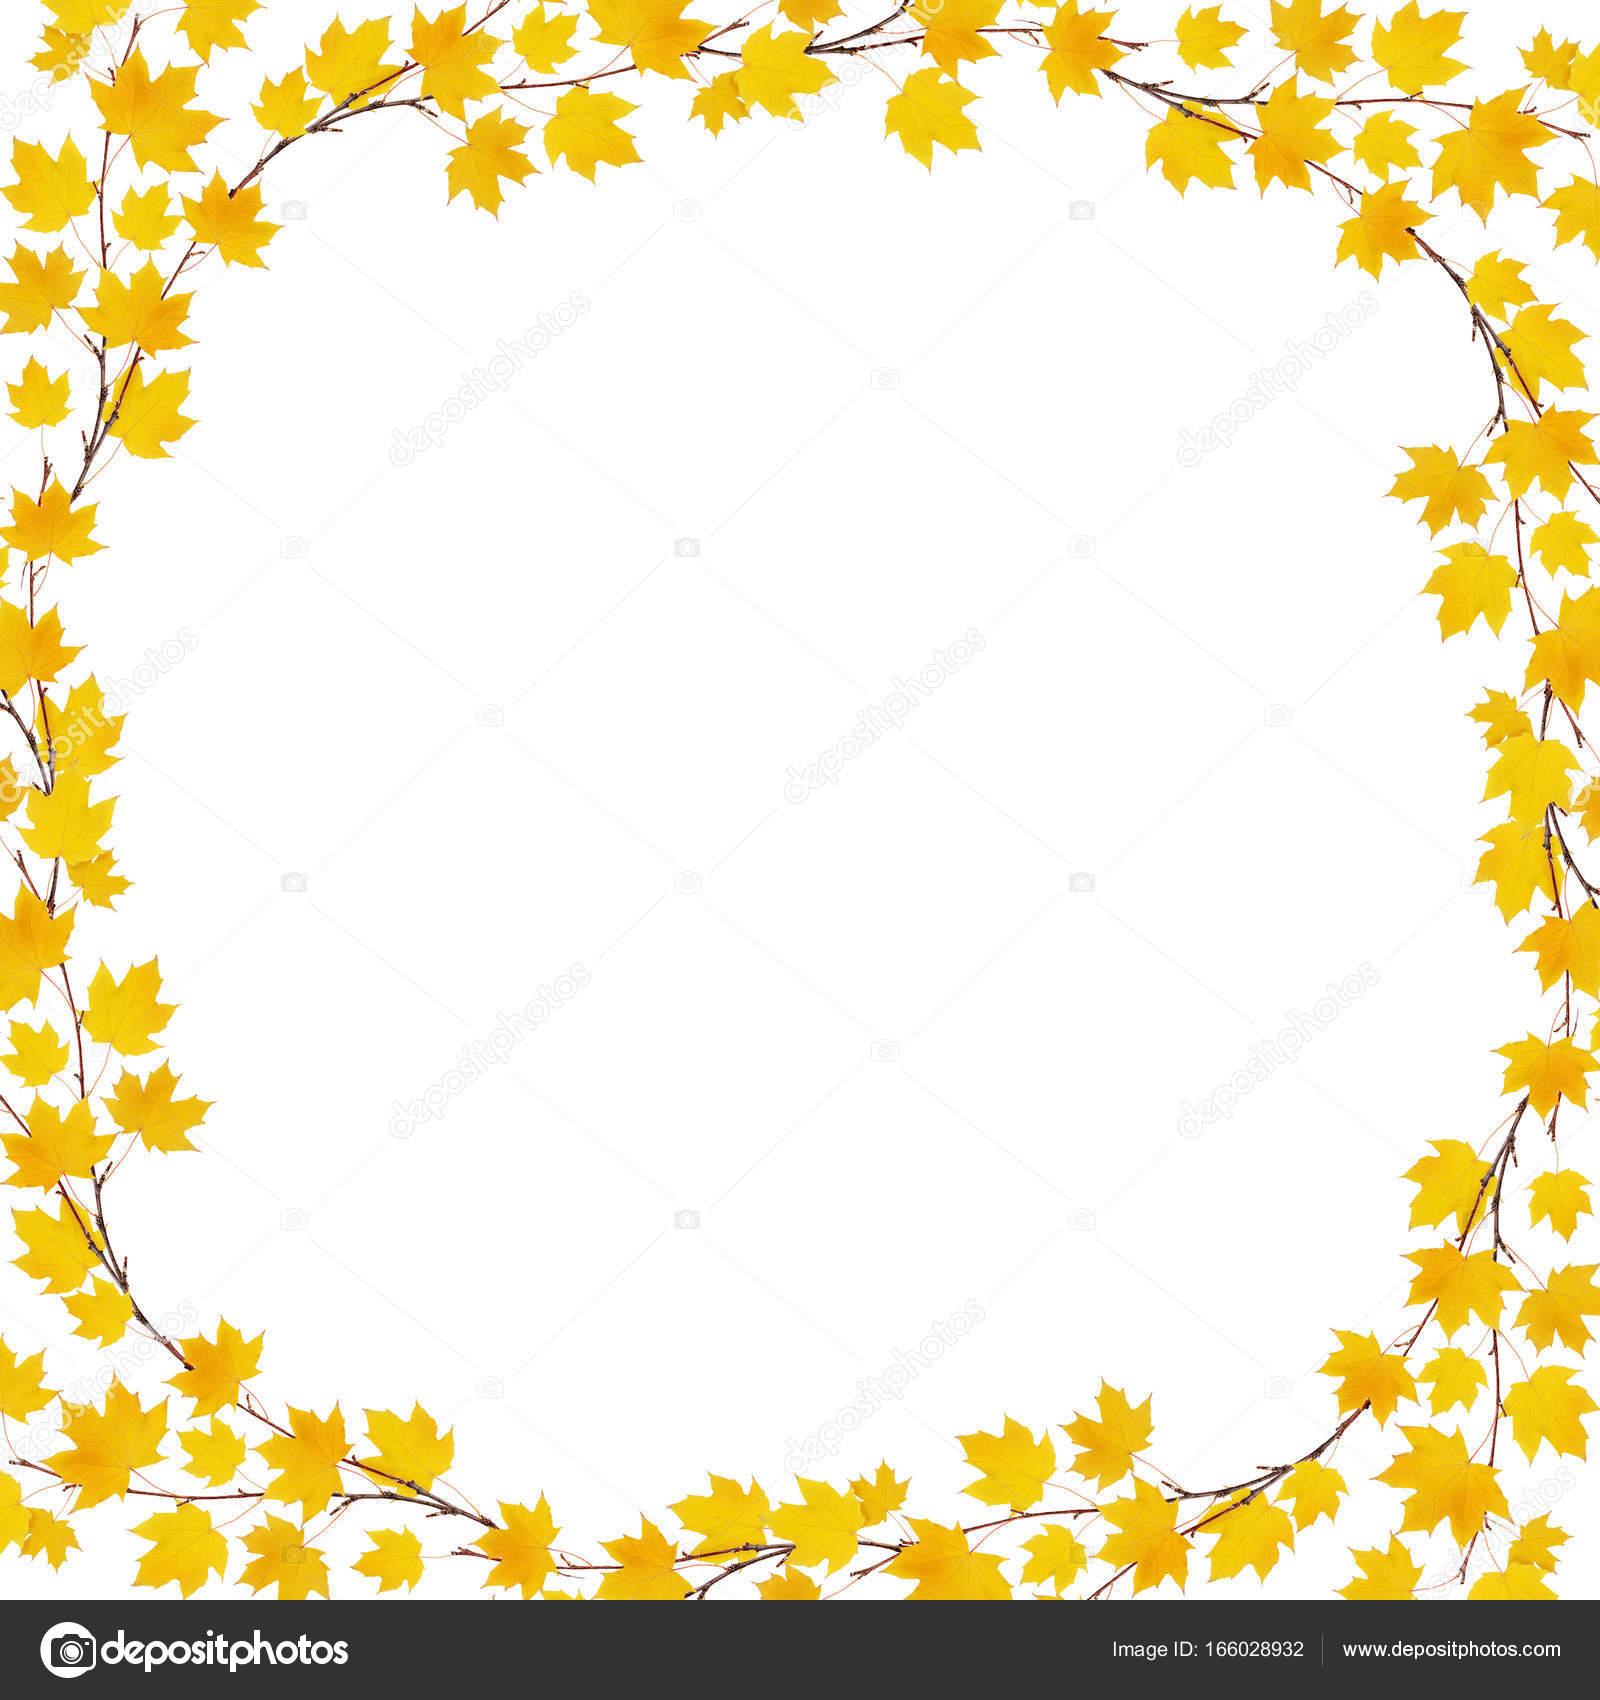 hojas de otoño Arce marco — Foto de stock © ksushsh #166028932